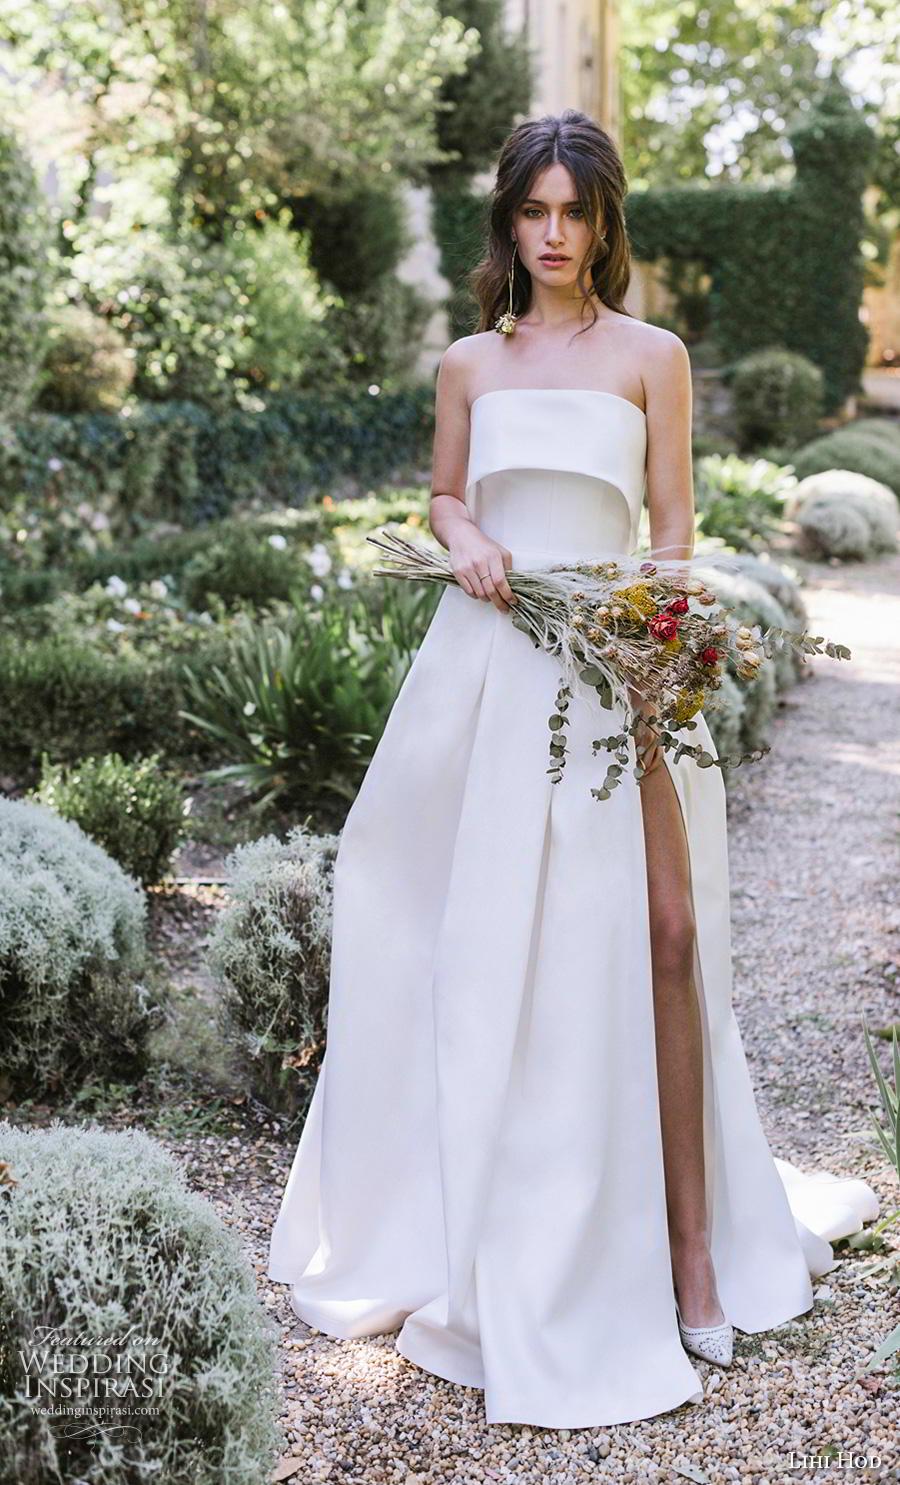 Wedding Dress Trends To Love In 2019 Necklines Sleeves Wedding